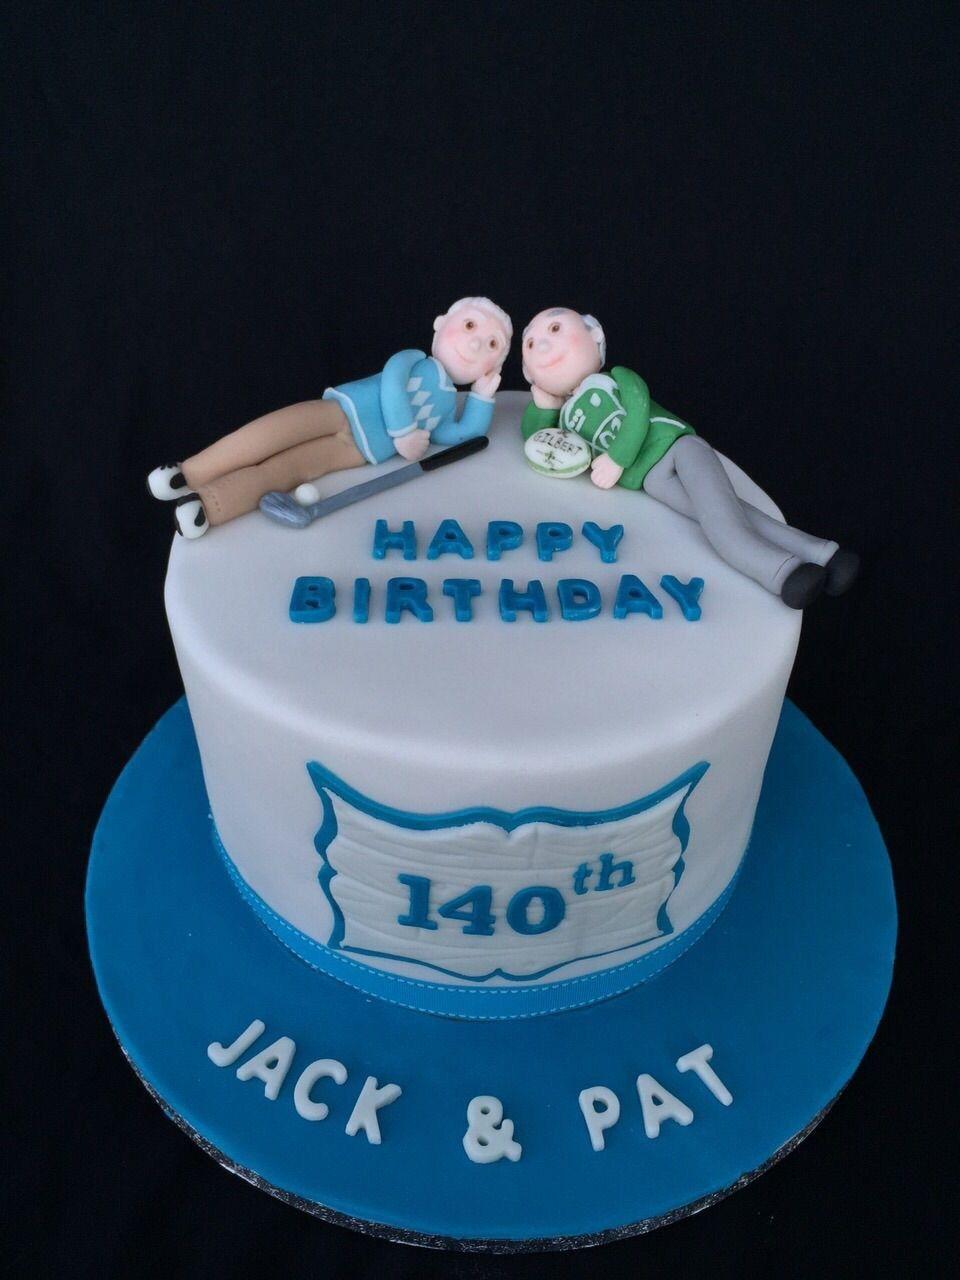 27 Marvelous Picture Of Happy Birthday Twins Cake Birijus Com Birthday Cake With Photo Cool Birthday Cakes Sister Birthday Cake